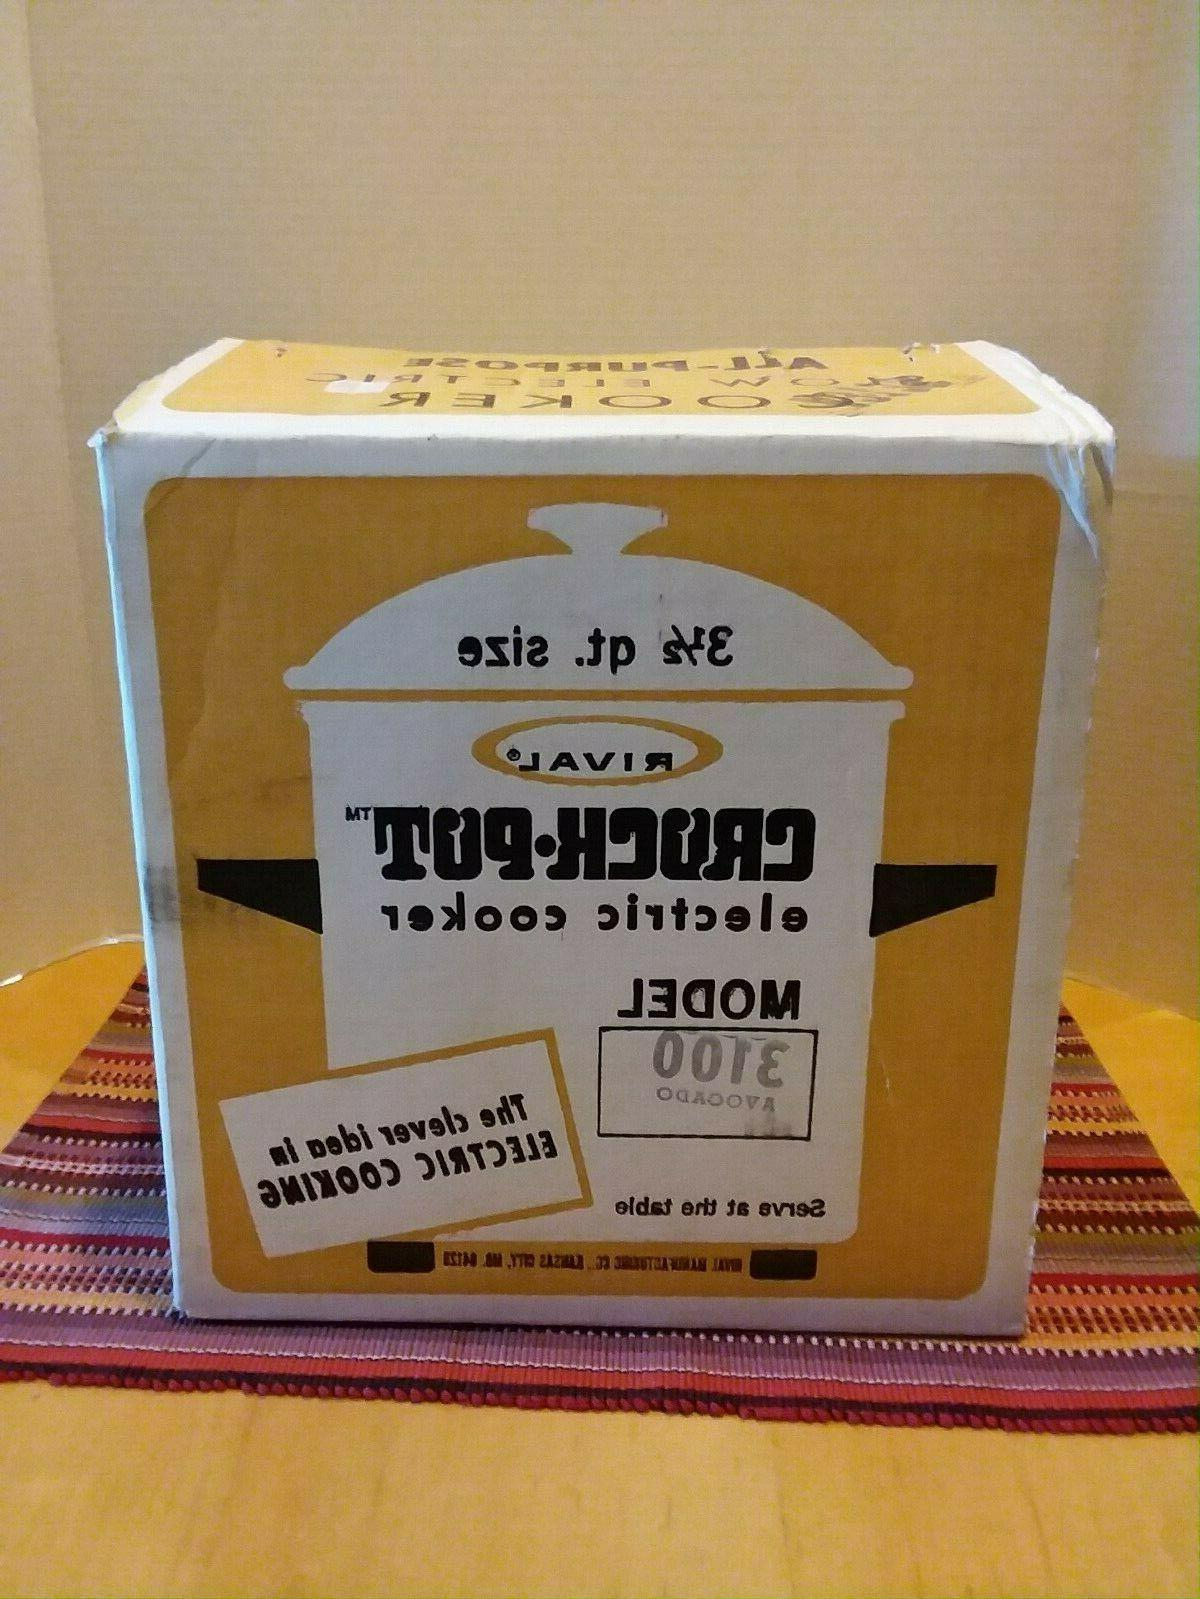 Vintage 1970s Rival Crock Pot Slow Cooker # 3100 new in open